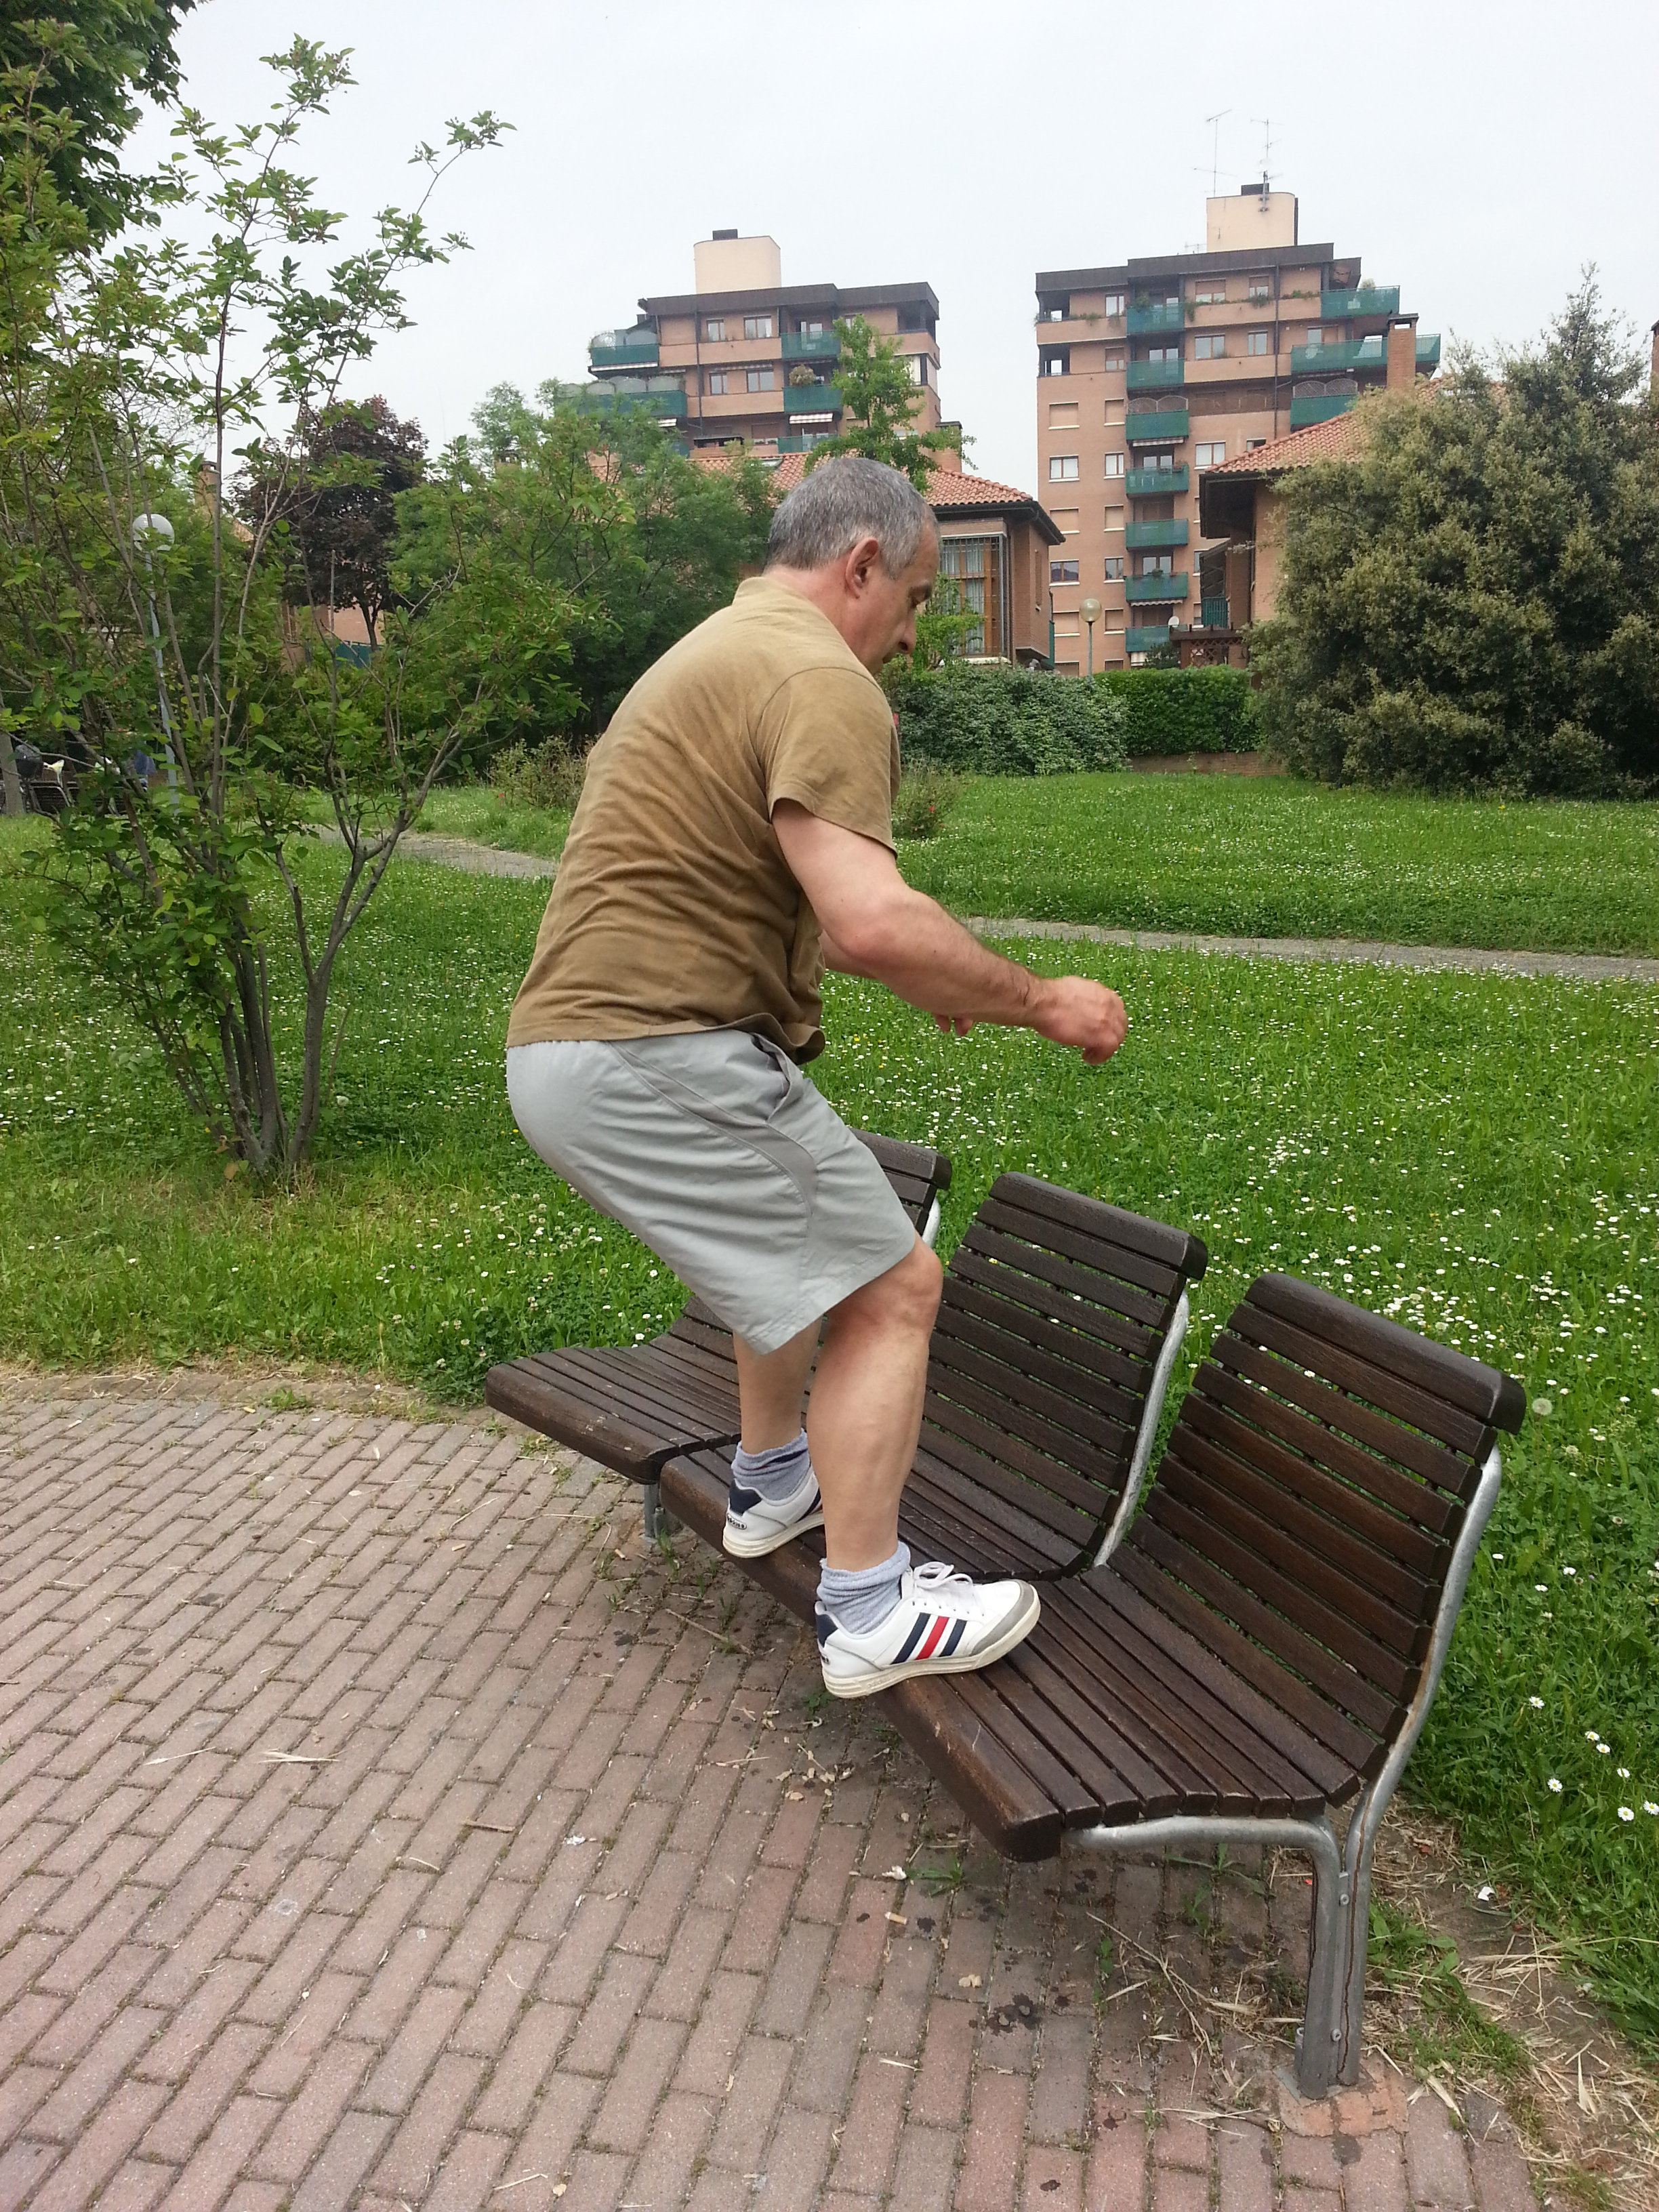 Sulla panchina